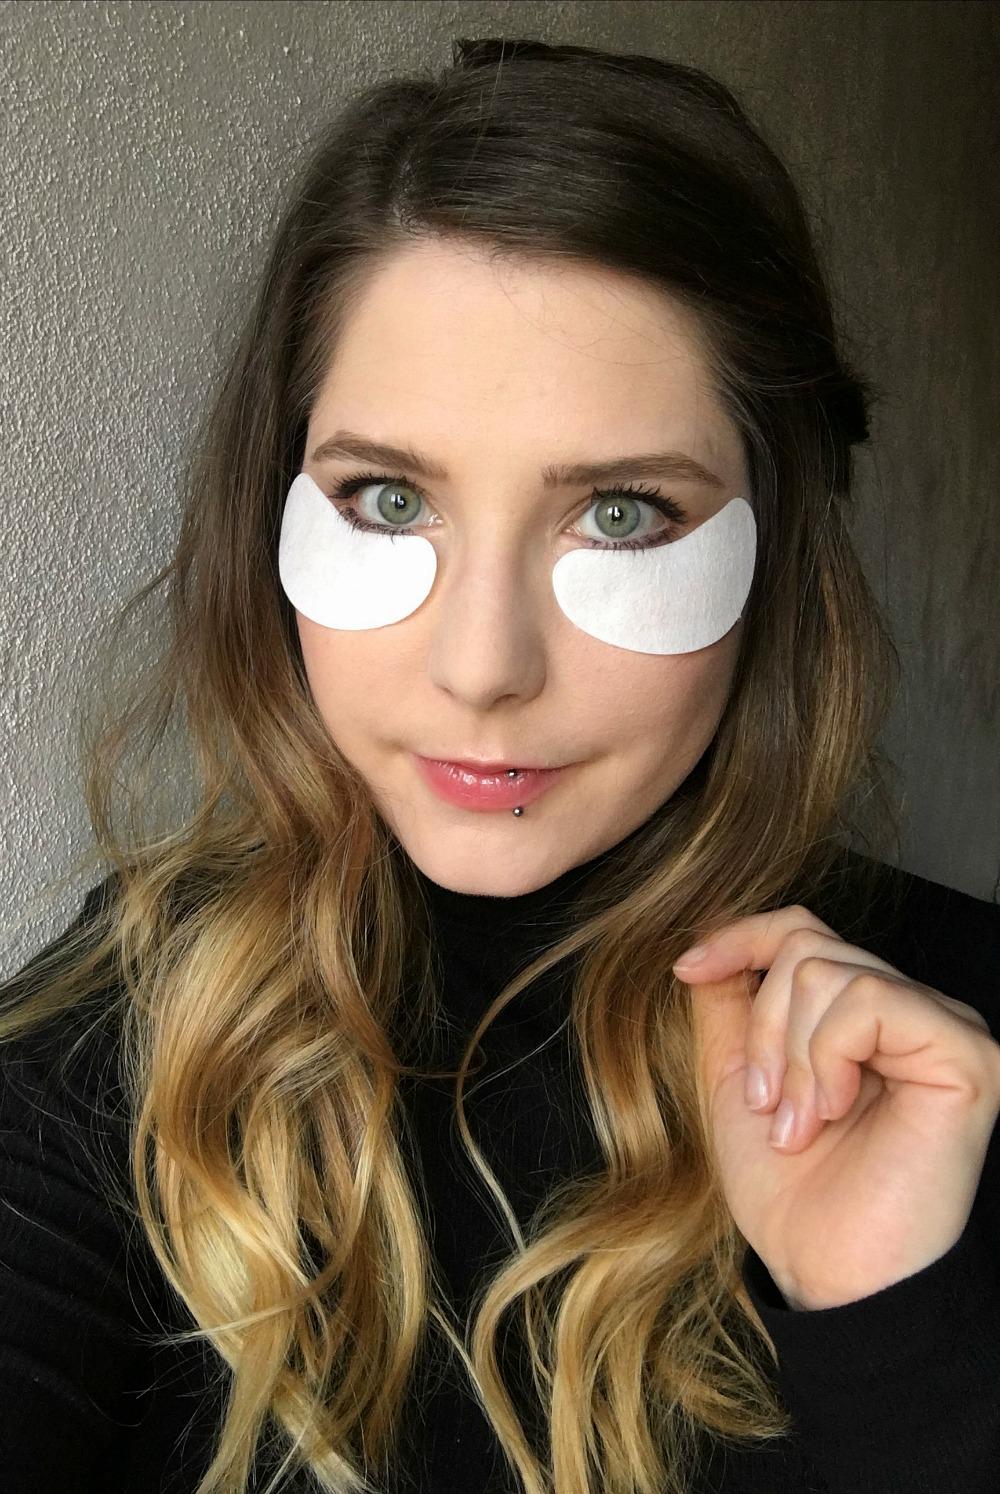 Wearing the VII Code Oxygen Eye Mask